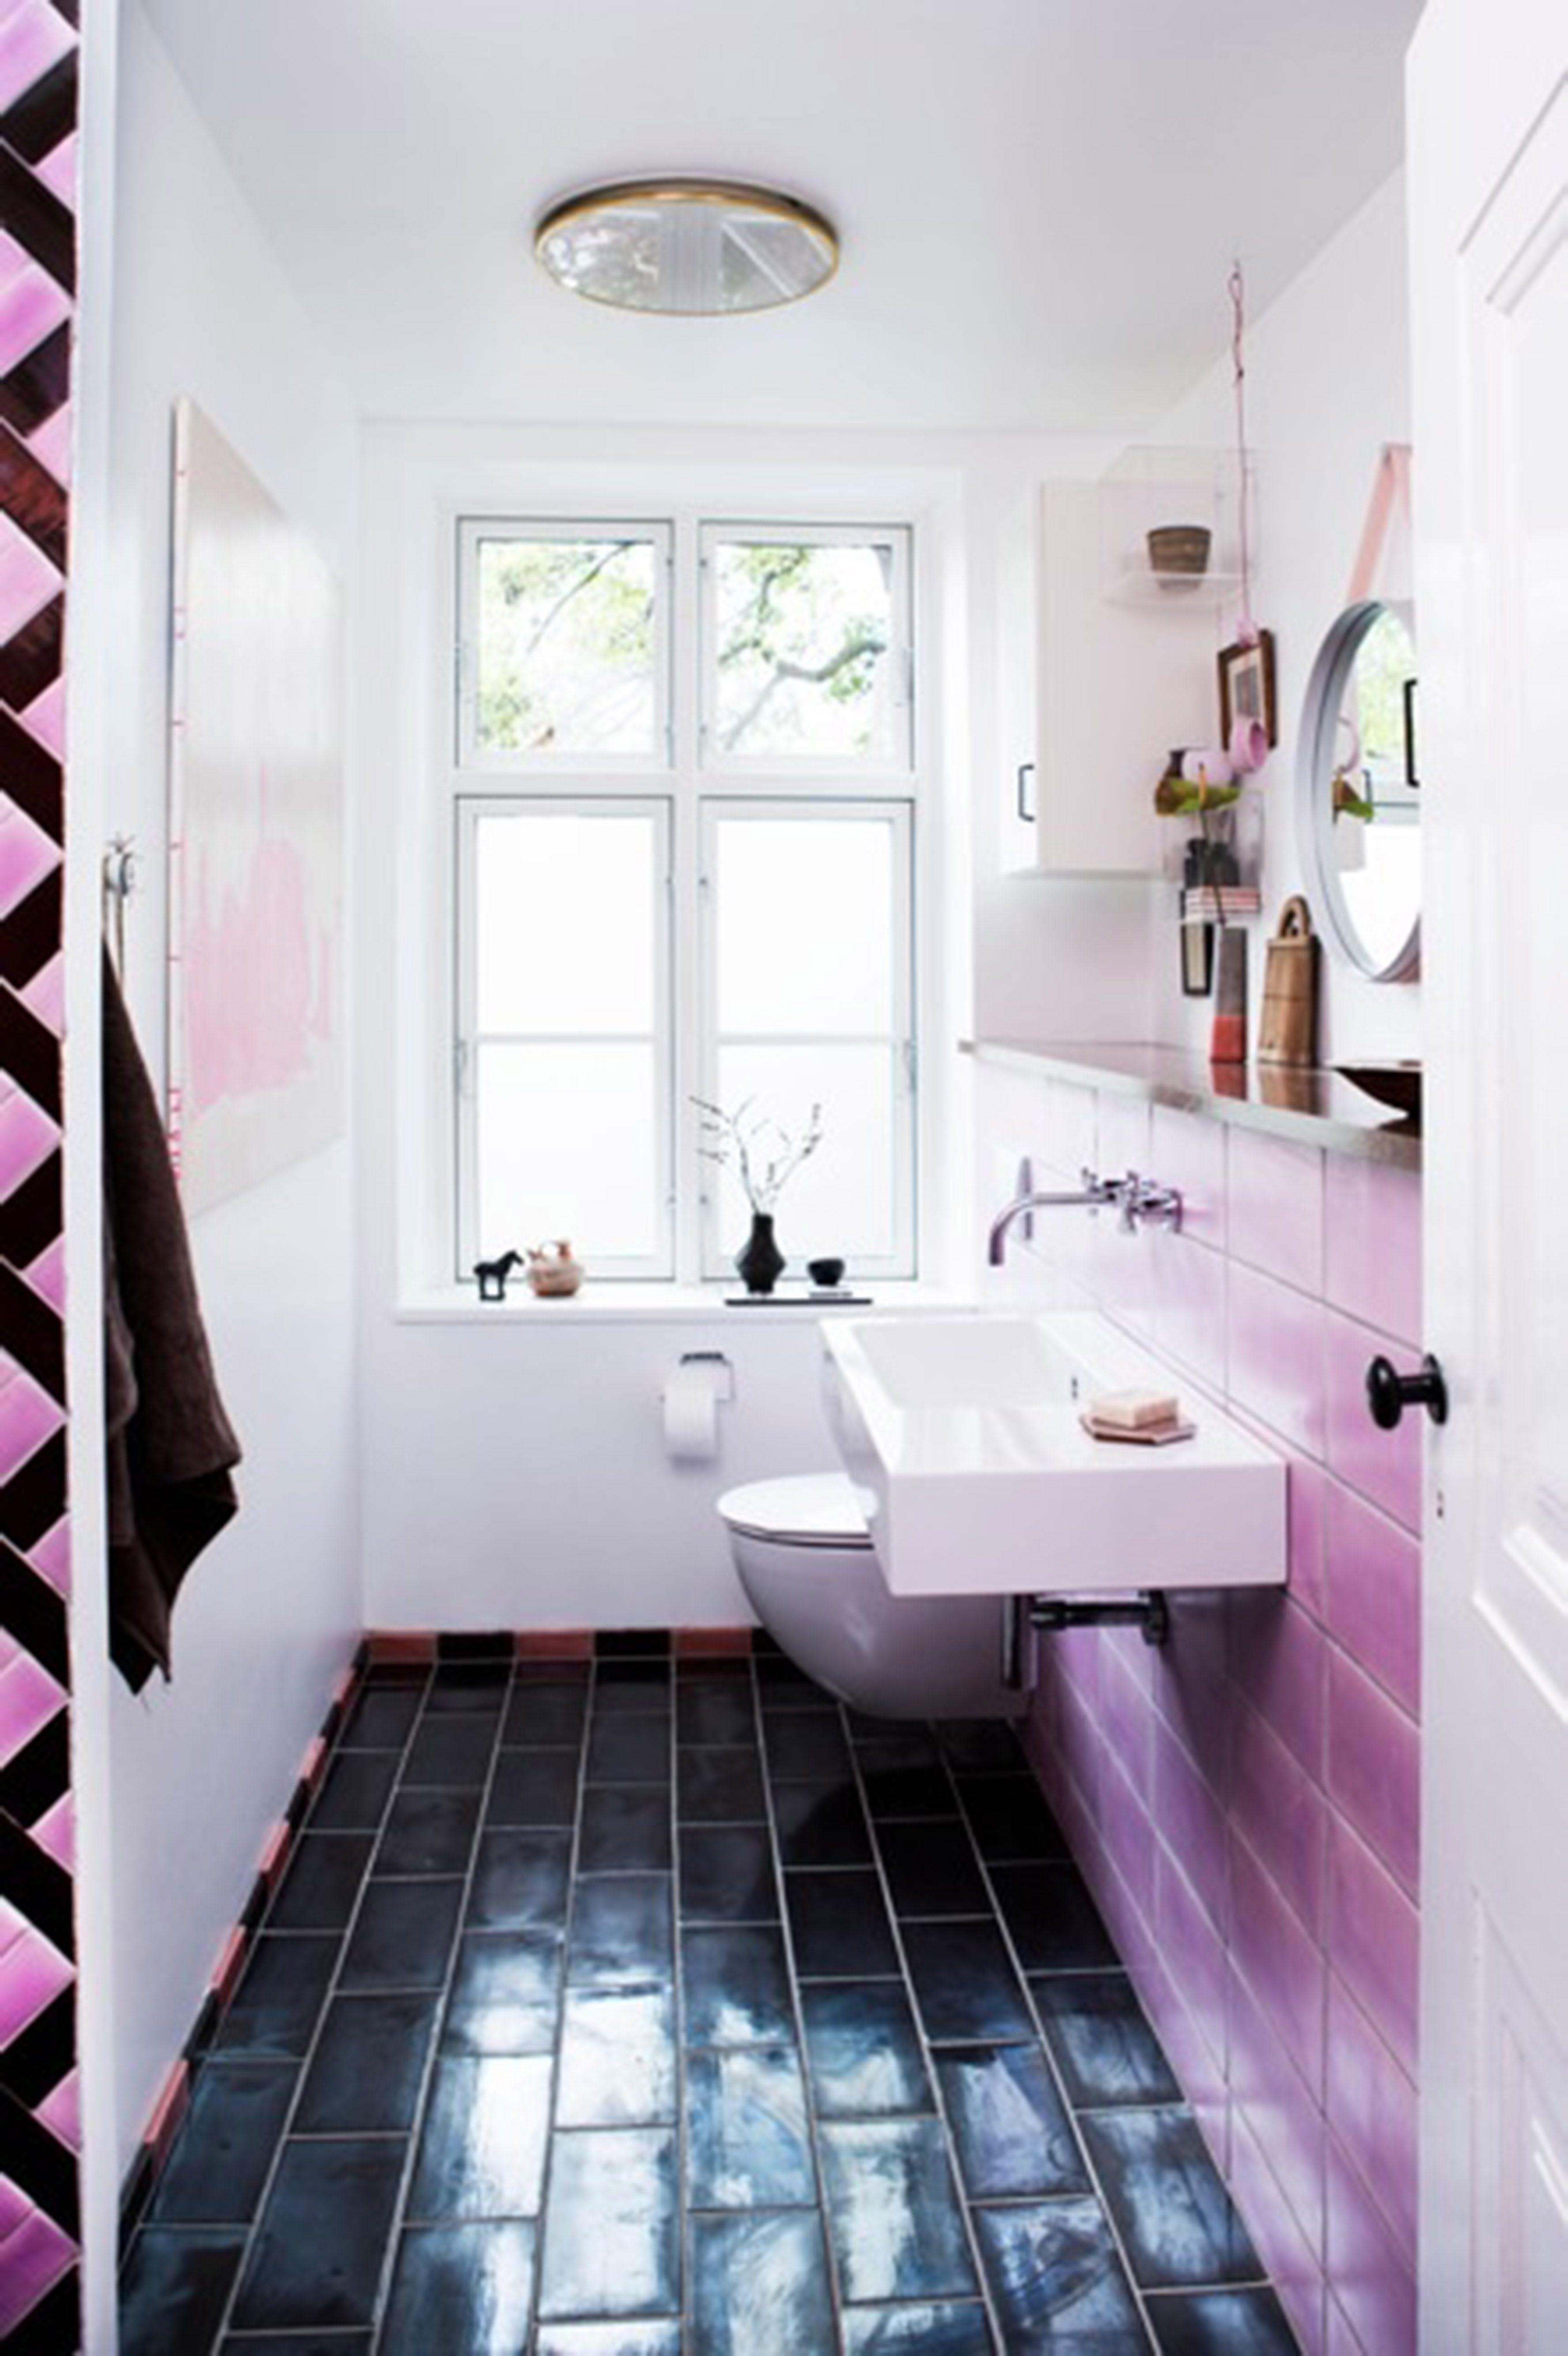 Tiled Bathrooms That Will Amaze You Bathroom Ideas